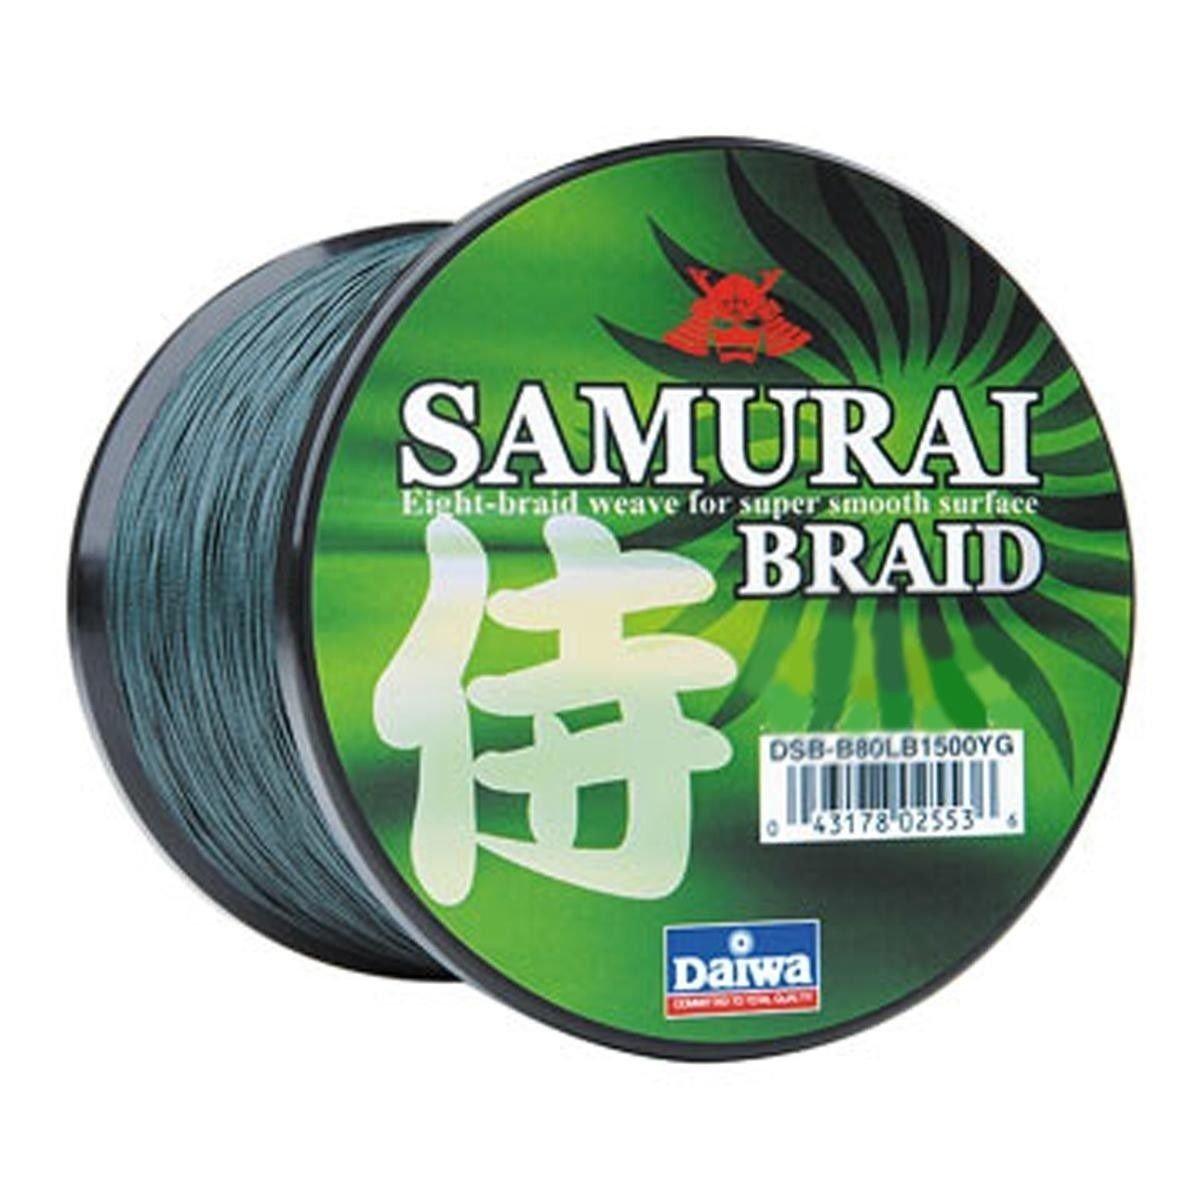 Daiwa DSB-B40LB150YG Samurai Braid